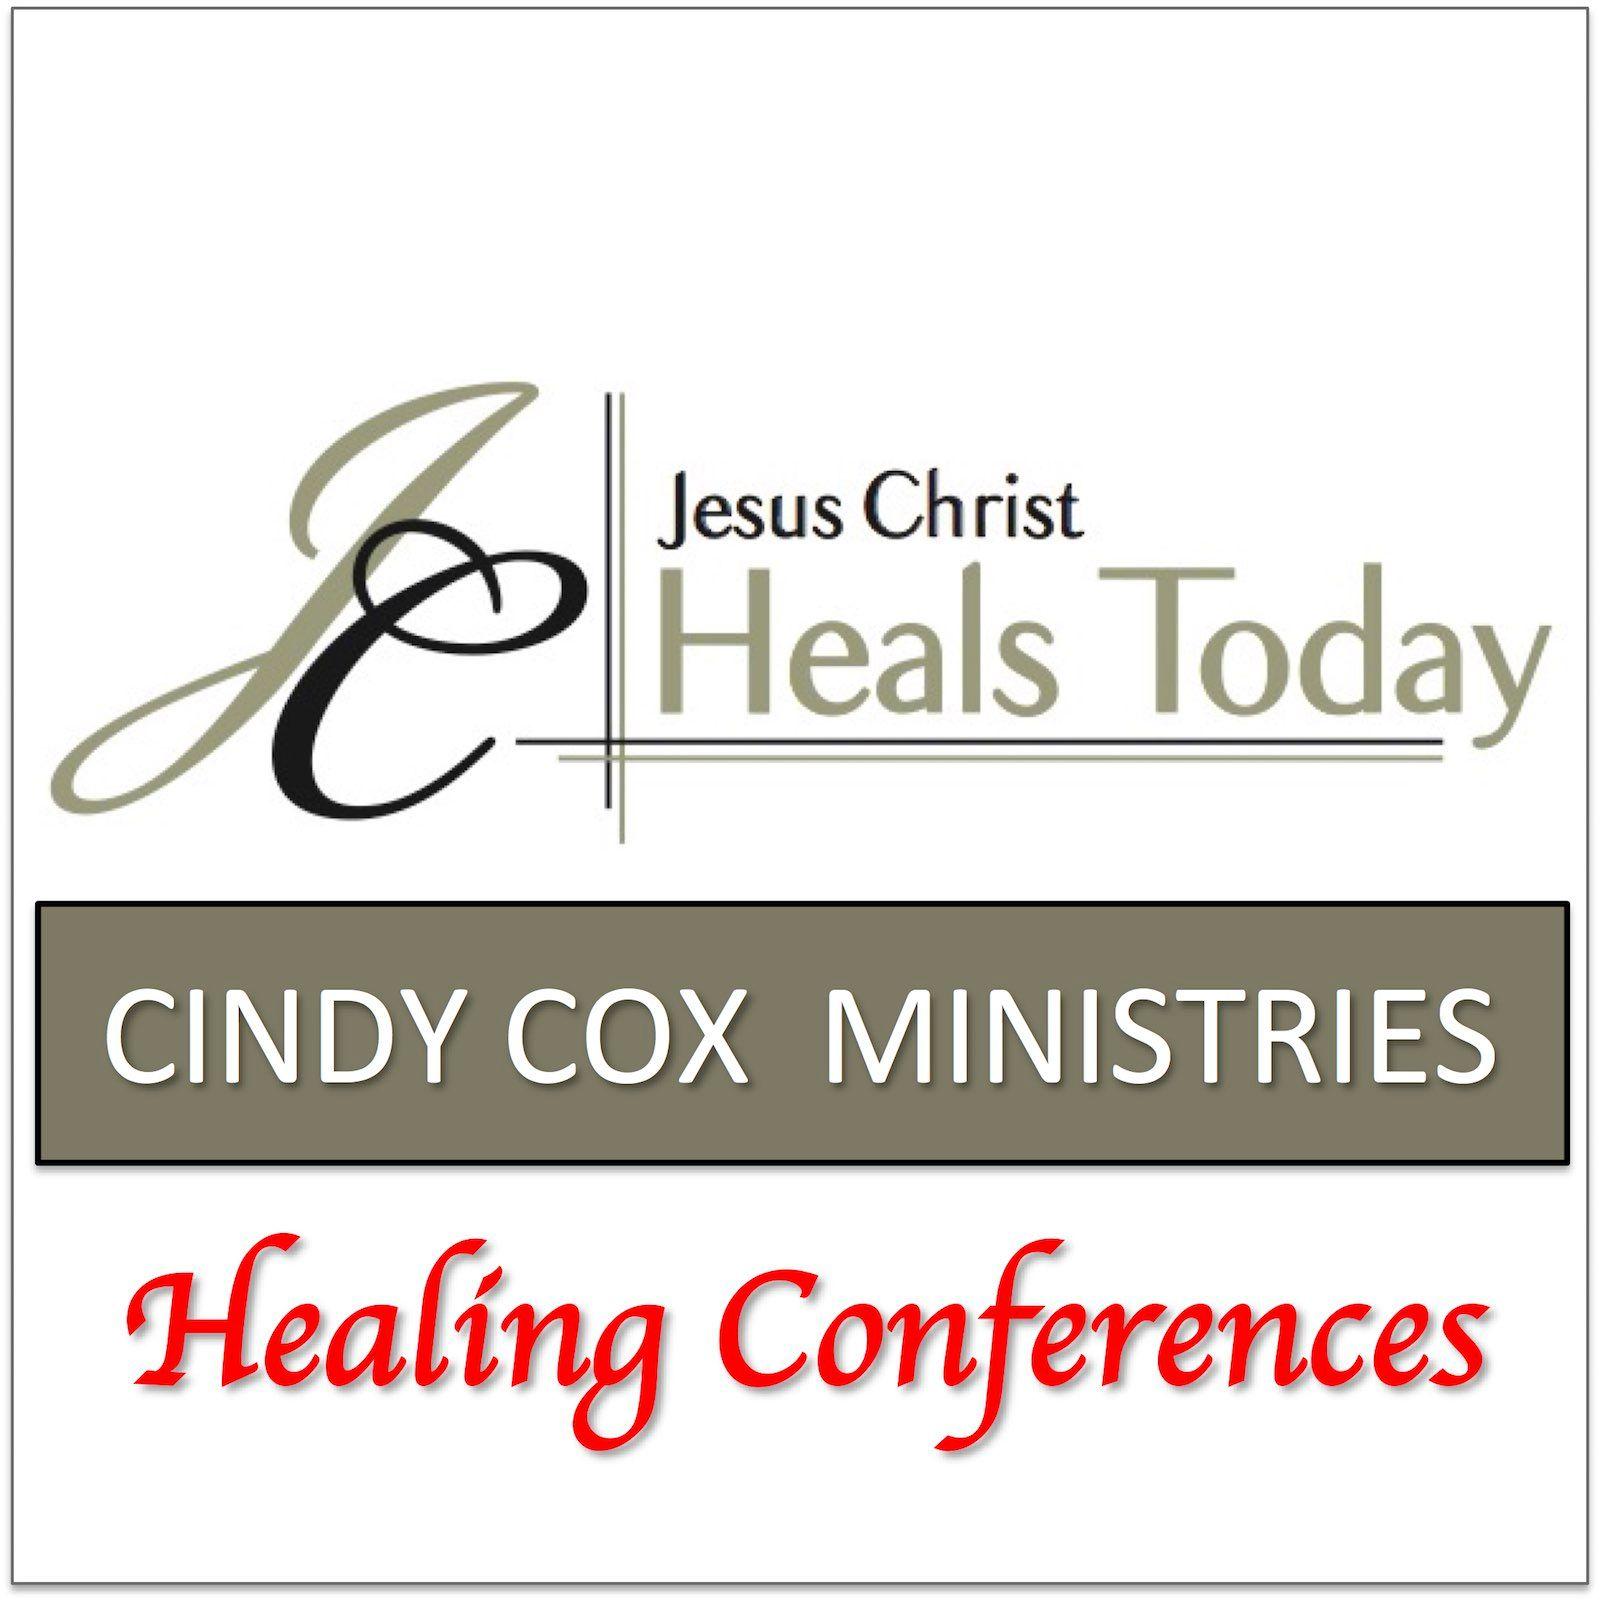 RLC Big Rapids - Jesus Heals Today, Session 2: Faith to Receive